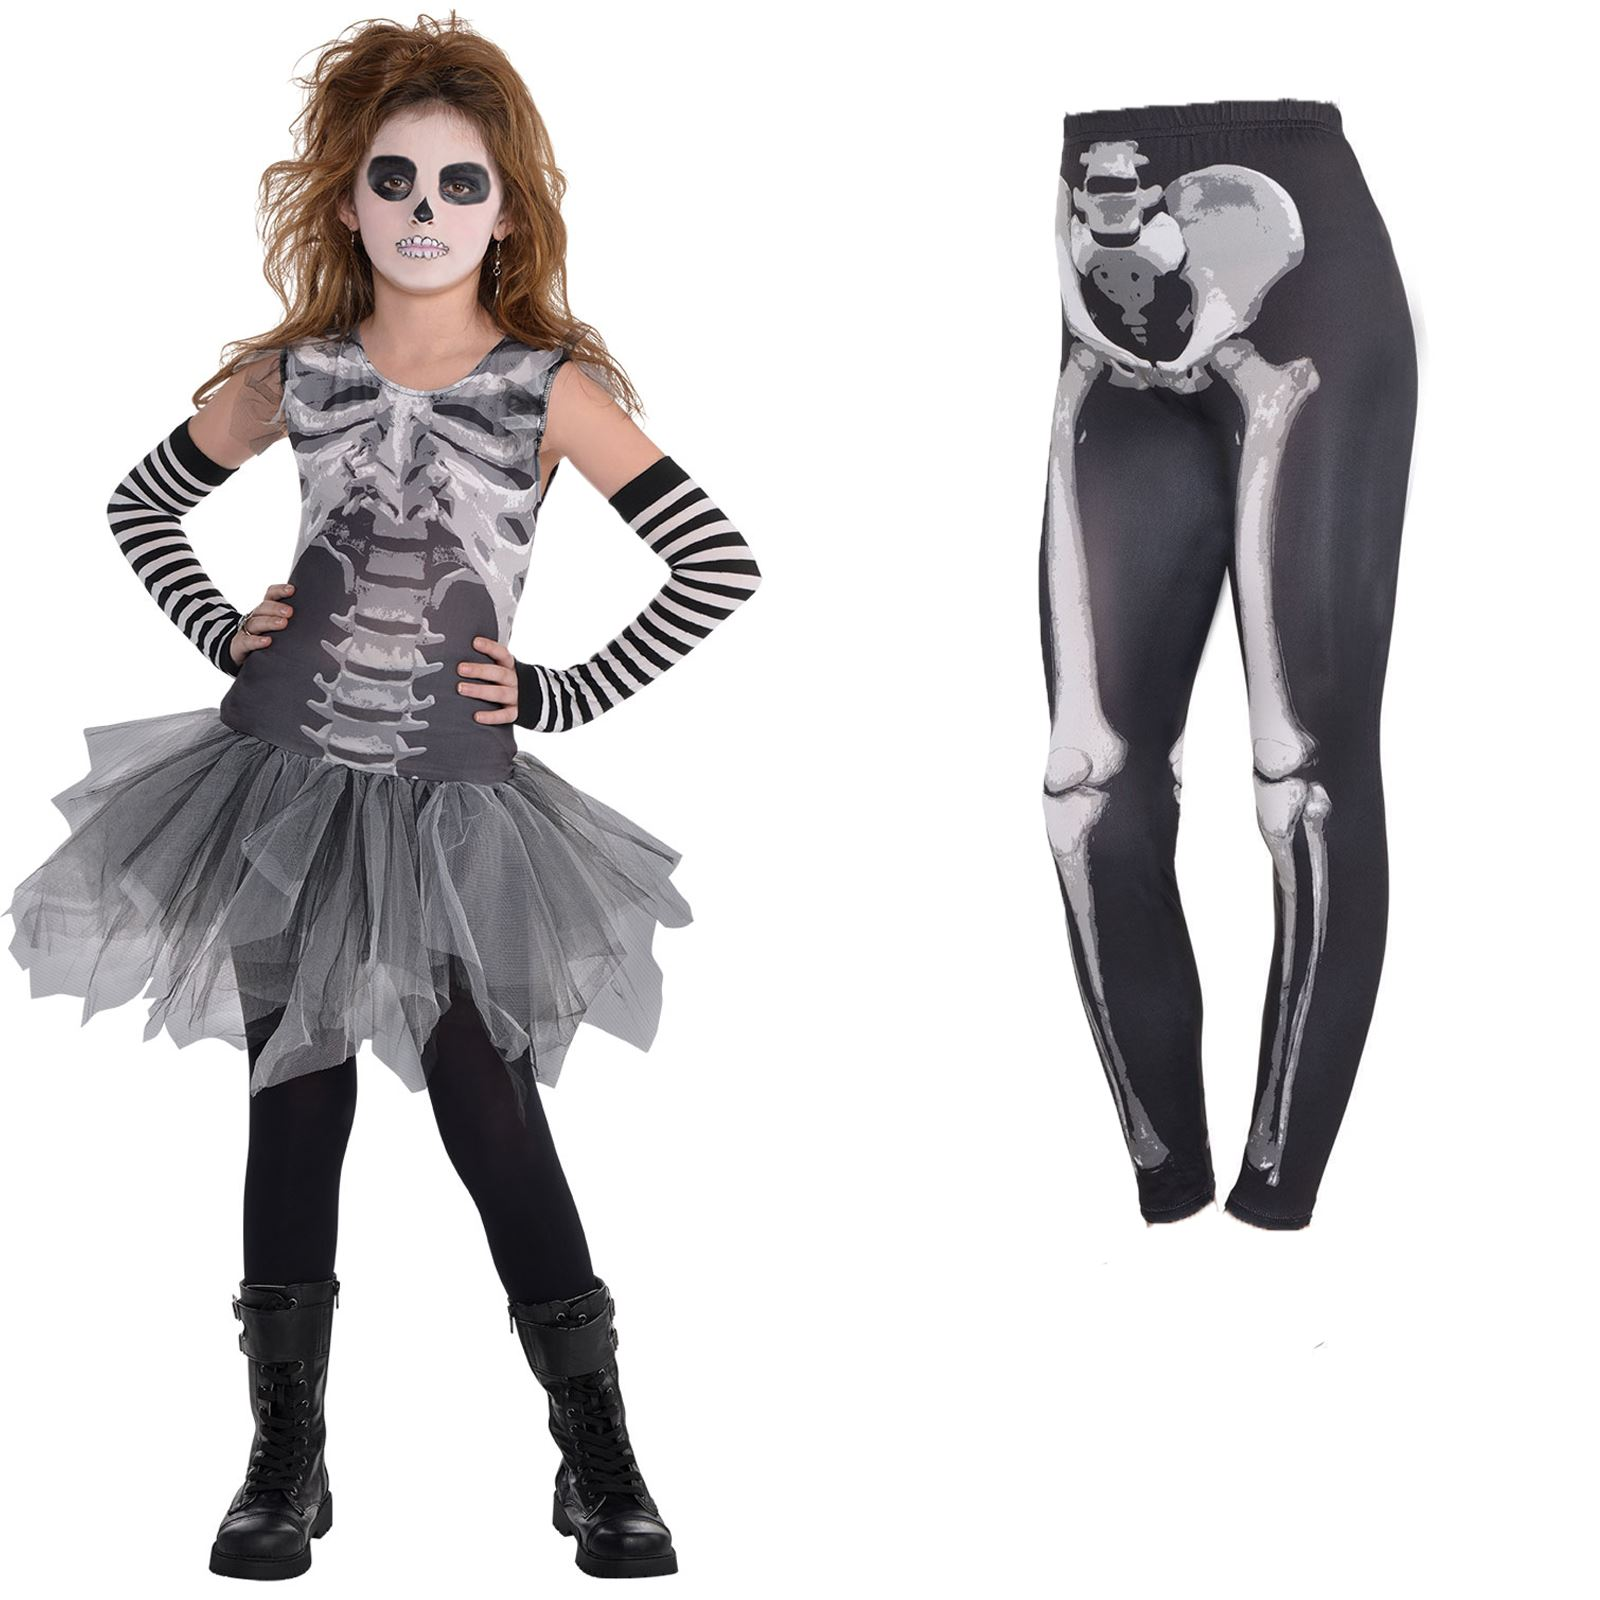 Damen Halloween Kostüm Kleid Skelett Knochen Gruseliges Outfit